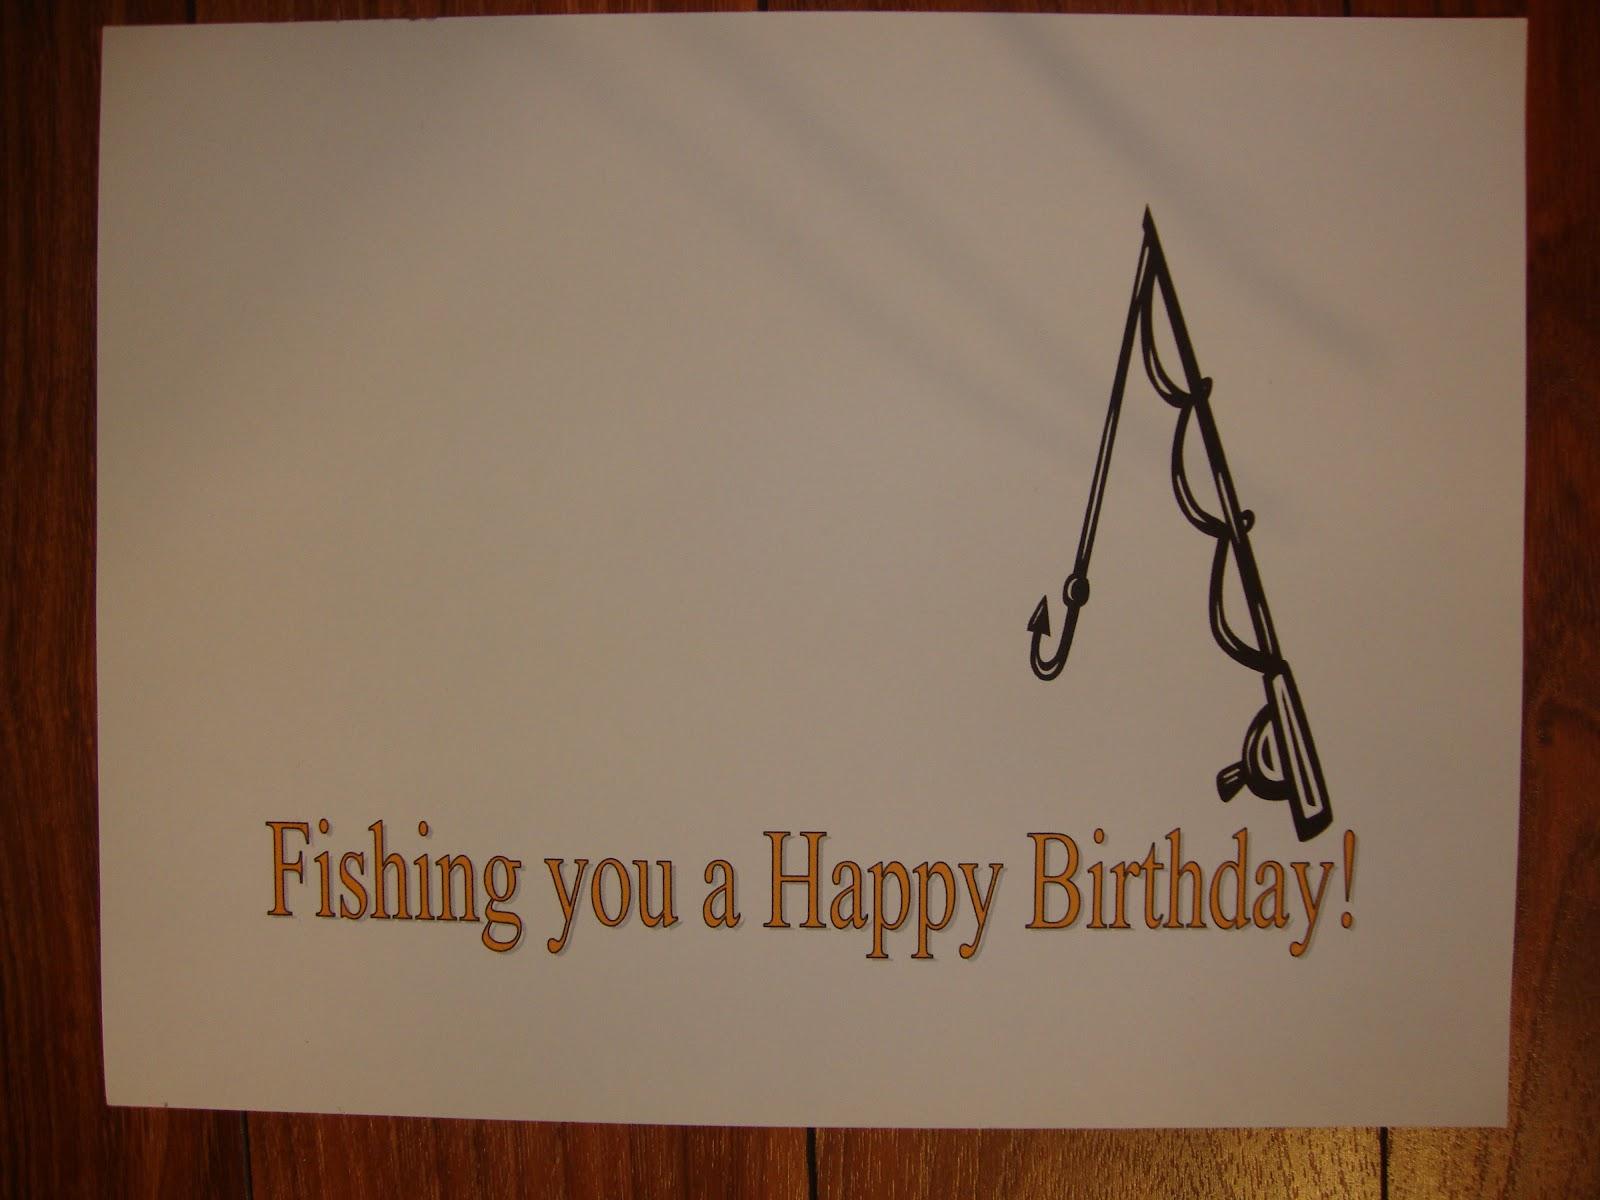 Happy birthday wishes for men fishing for Fishing birthday wishes